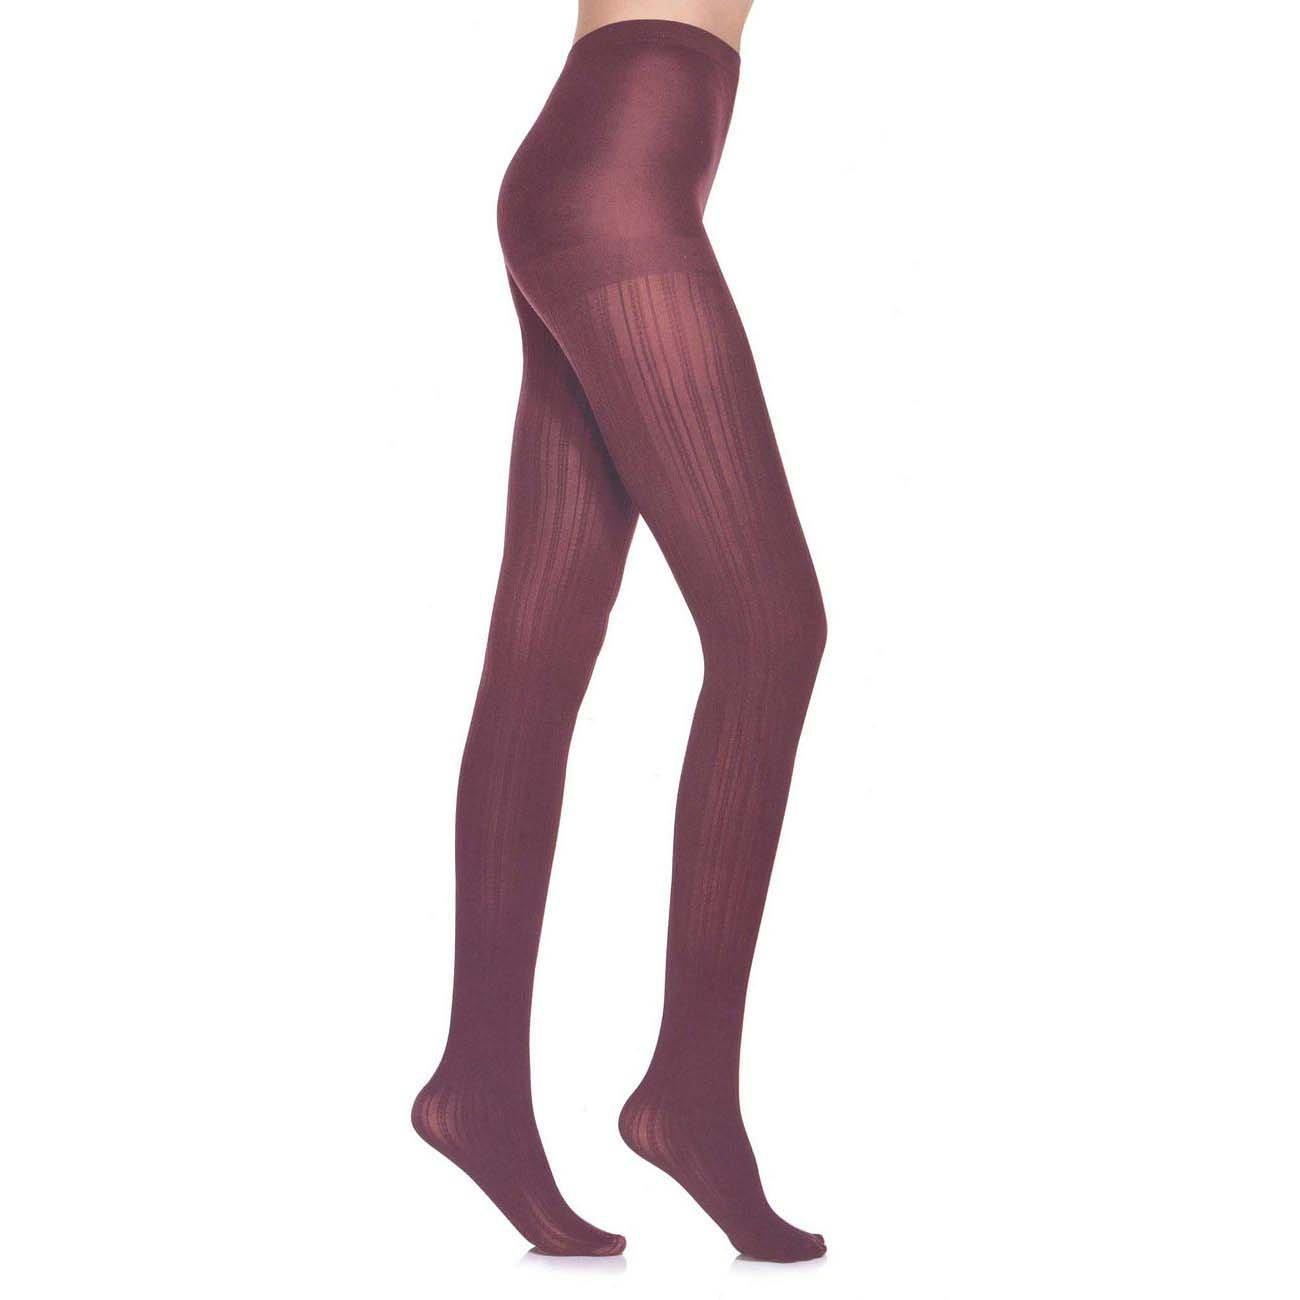 bca7e5ee5 Lupo Women s Pantyhose Fashion 70 Denier